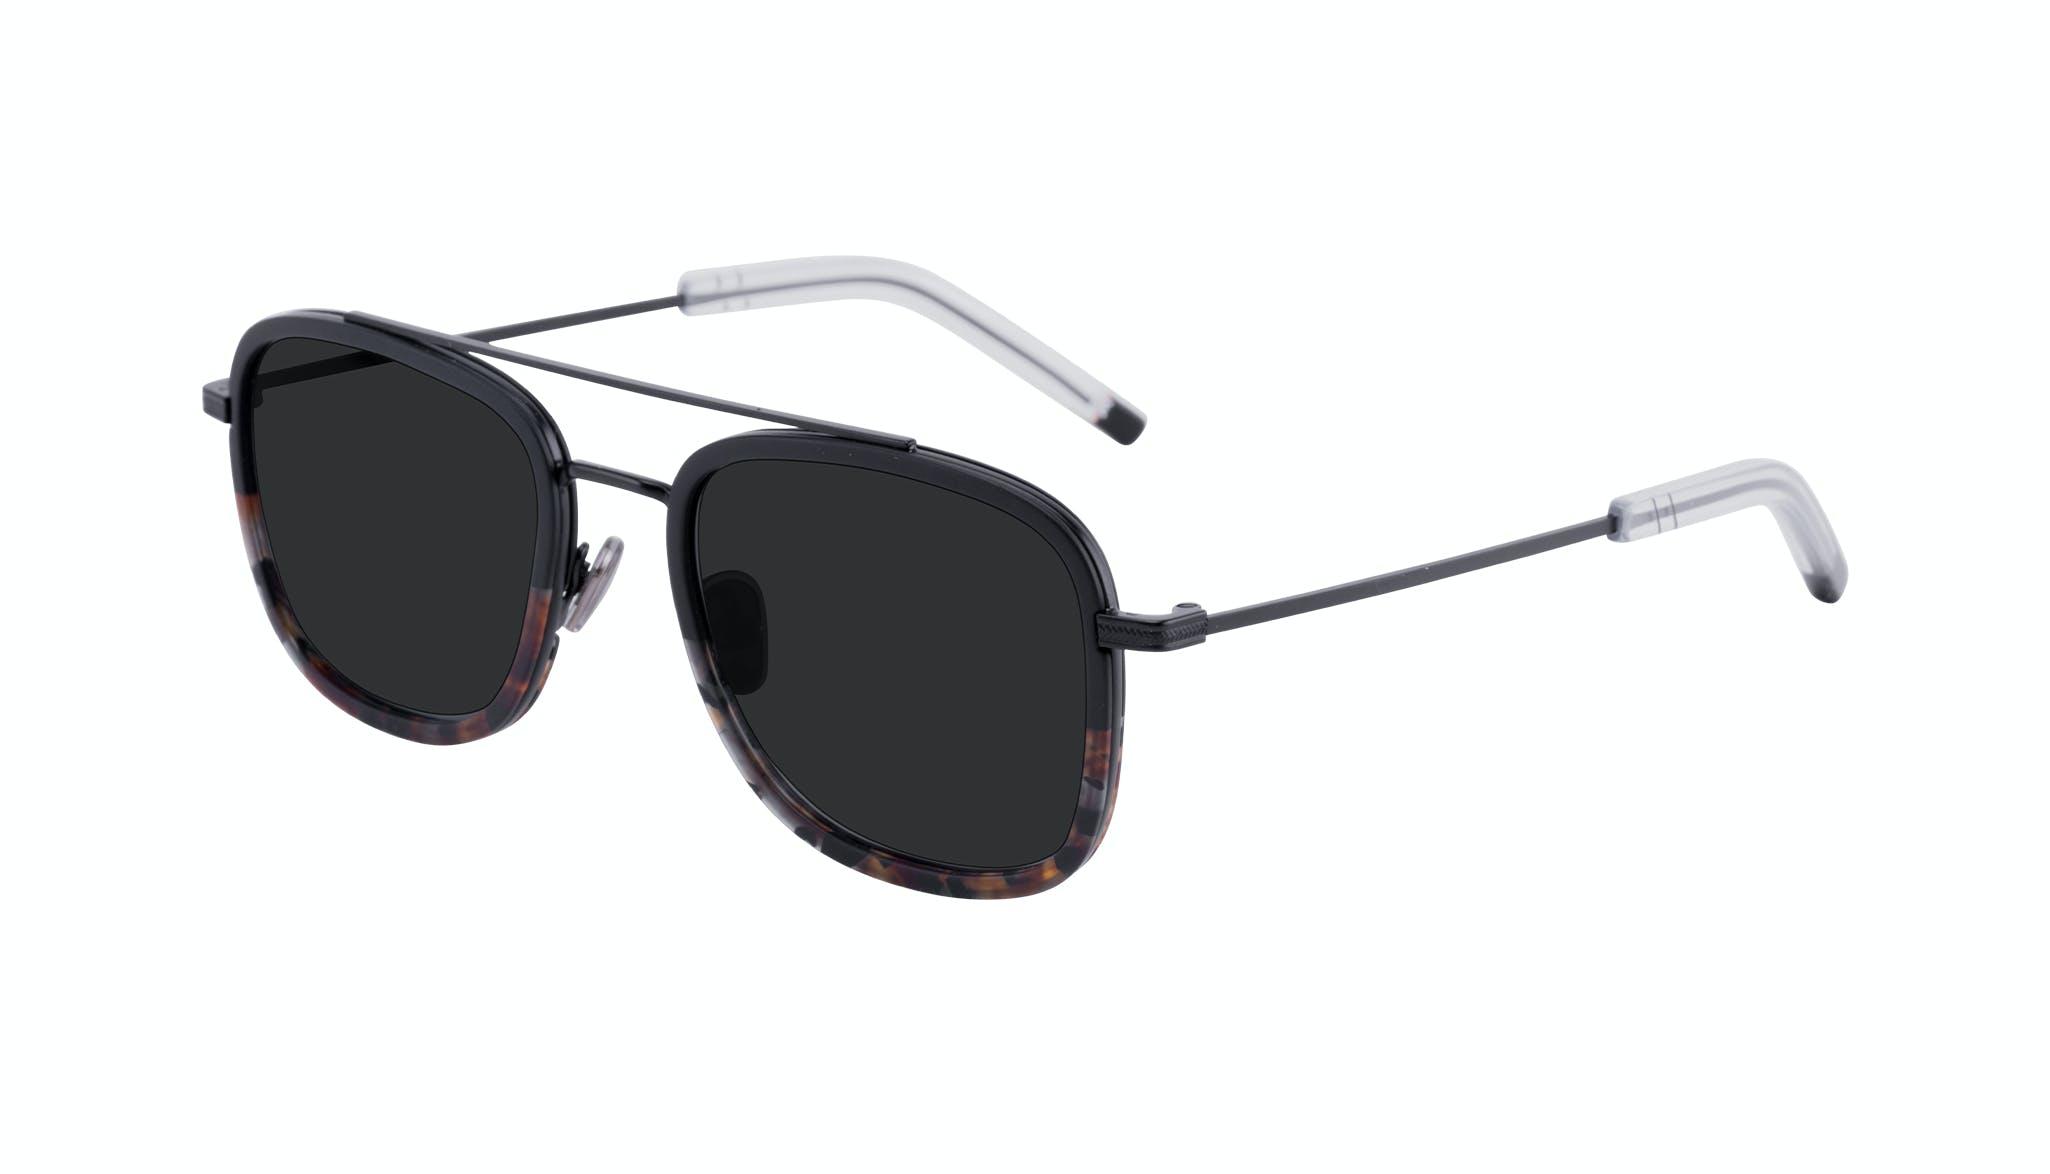 Affordable Fashion Glasses Aviator Rectangle Sunglasses Men Class Mahogany Tilt